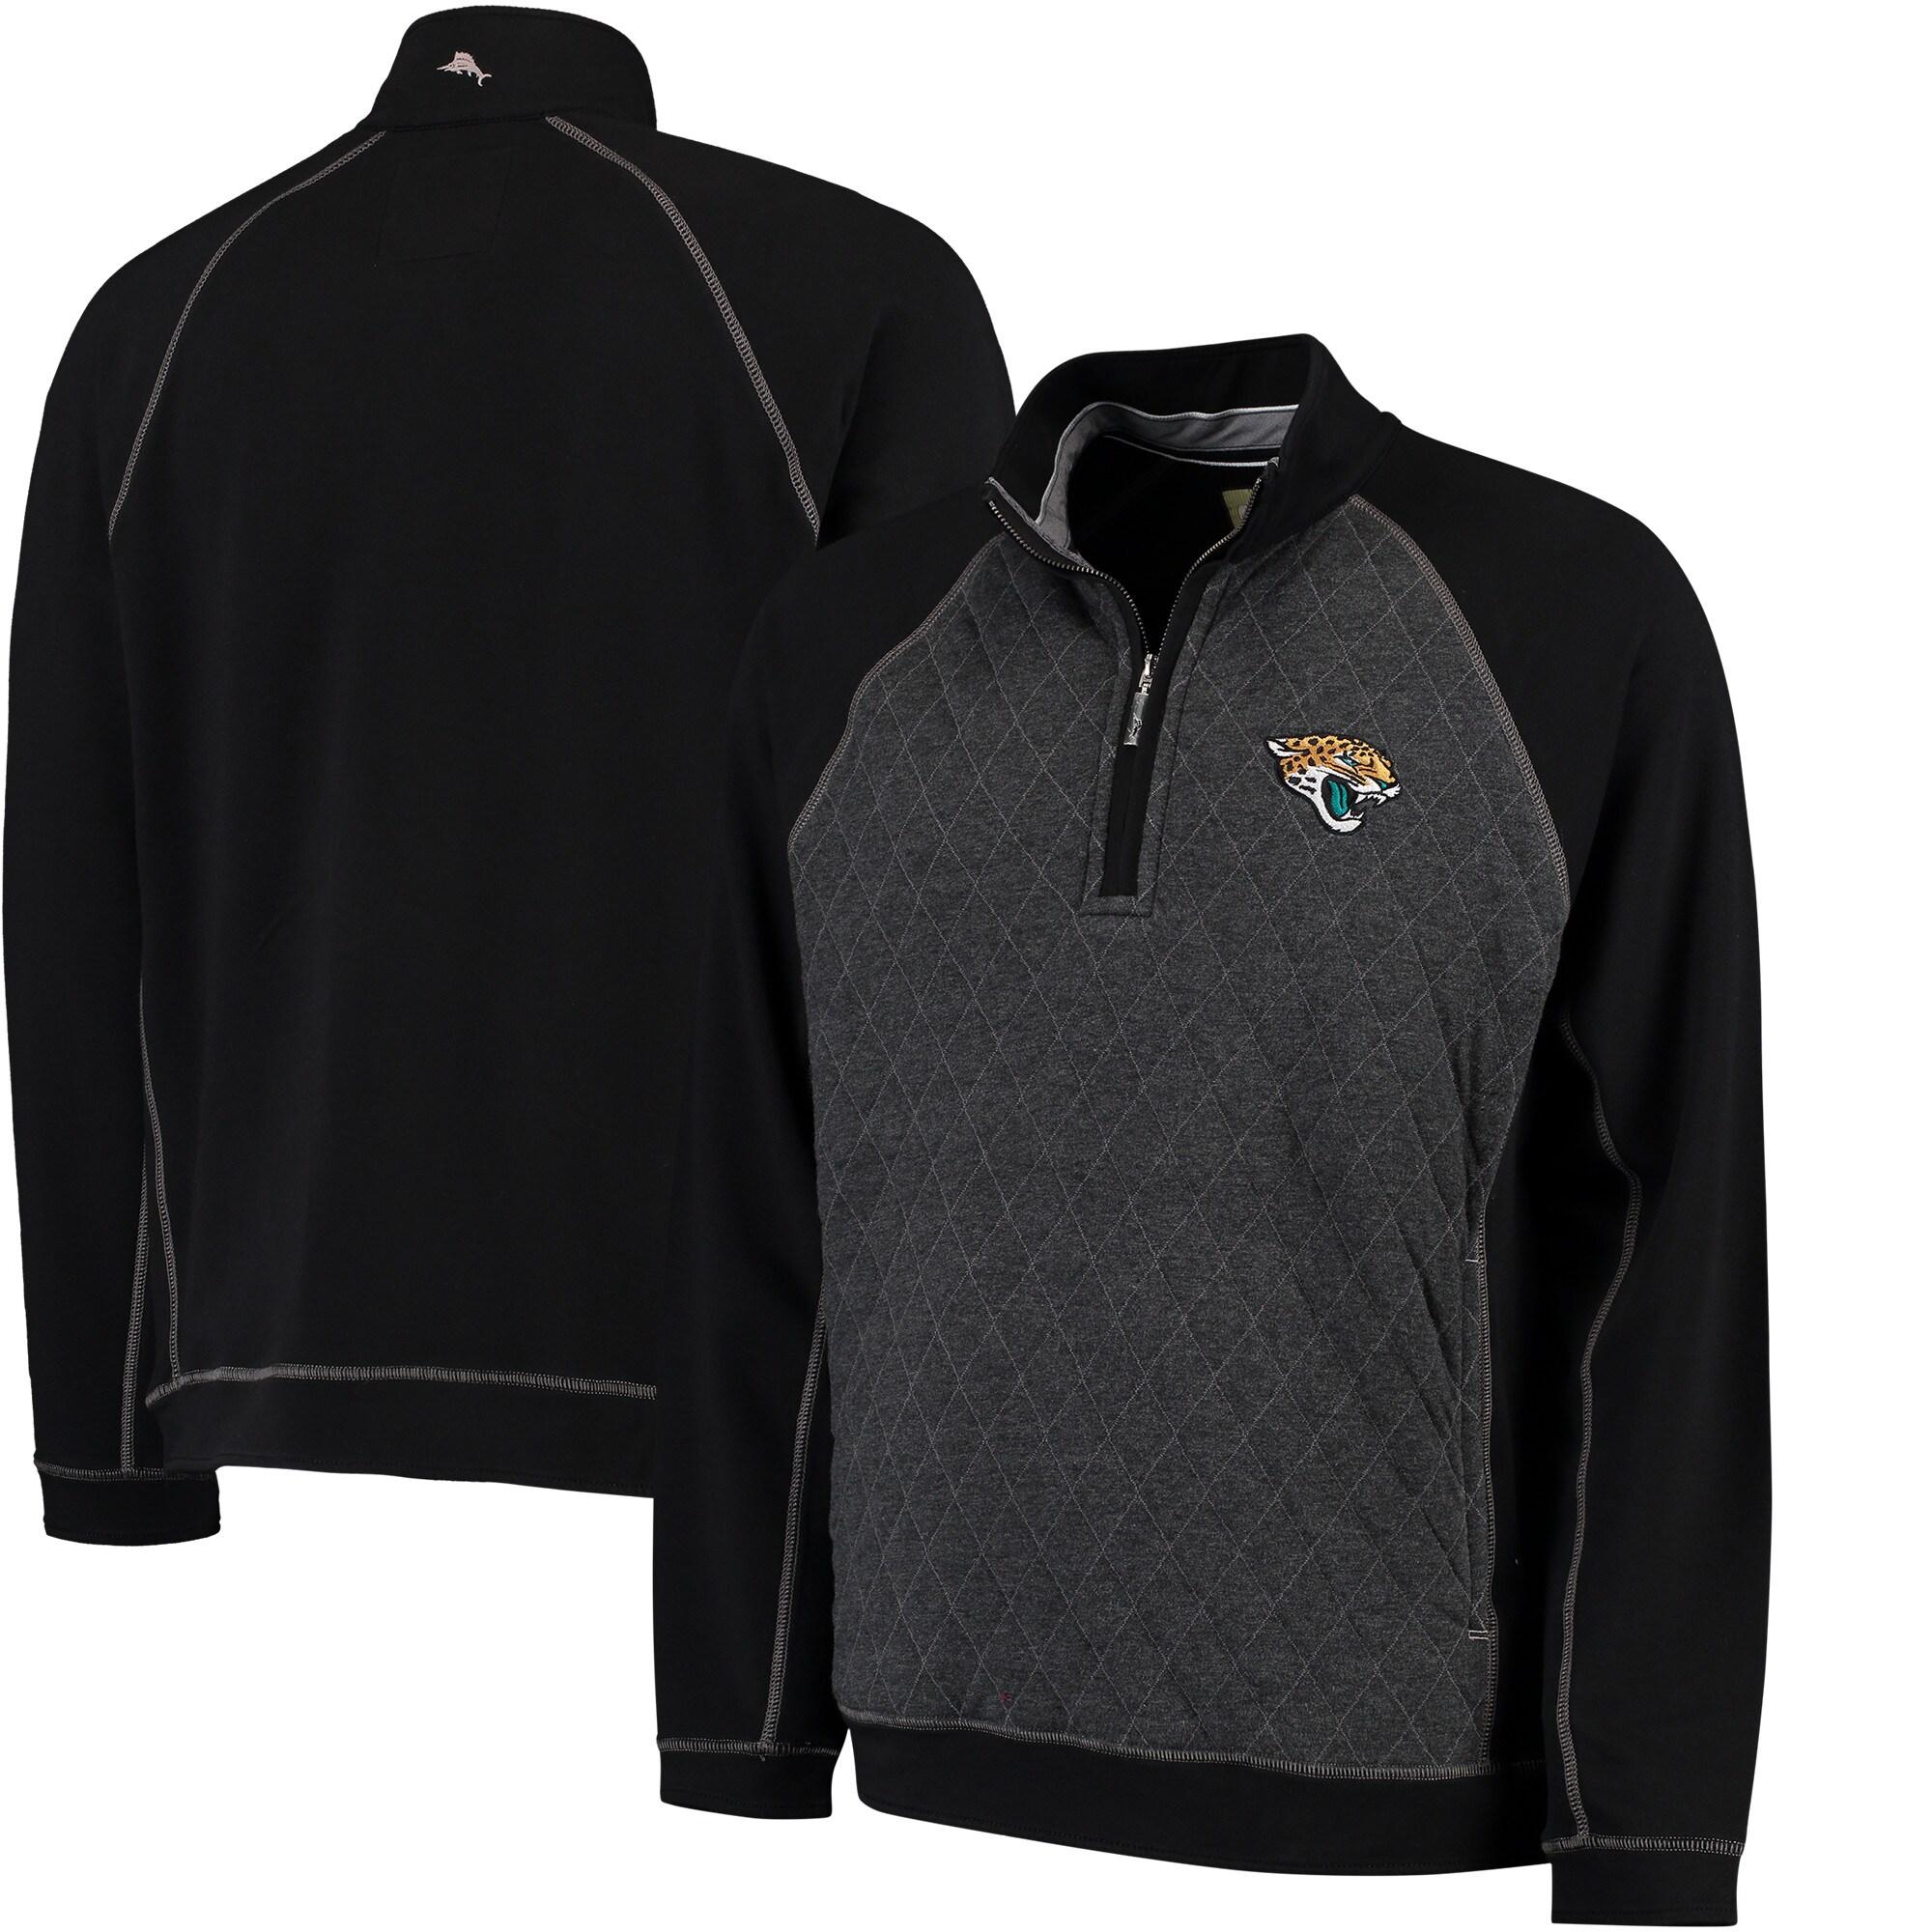 Jacksonville Jaguars Tommy Bahama Gridiron Half-Zip Sweater - Black